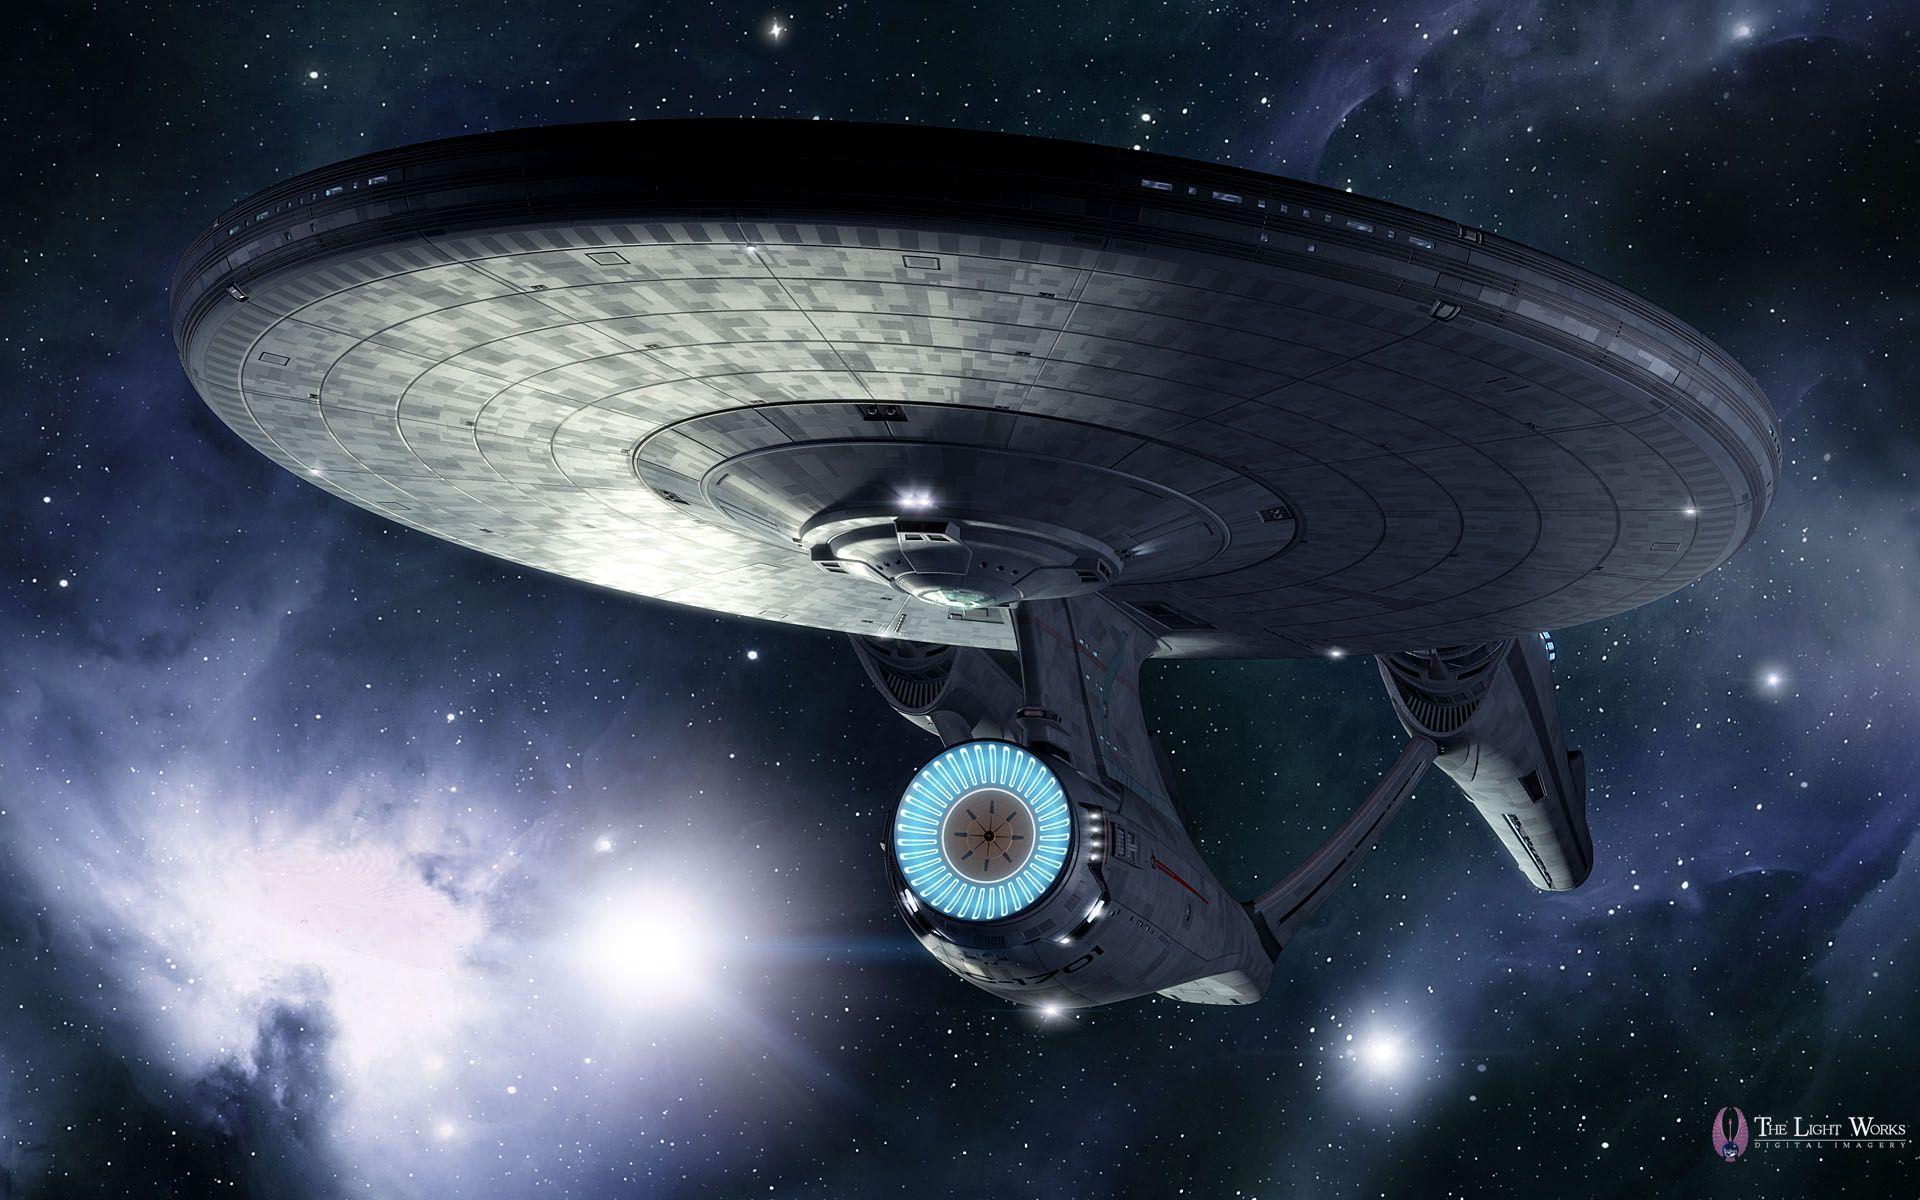 J J Abrams U S S Enterprise Ncc 1701 With Images Star Trek